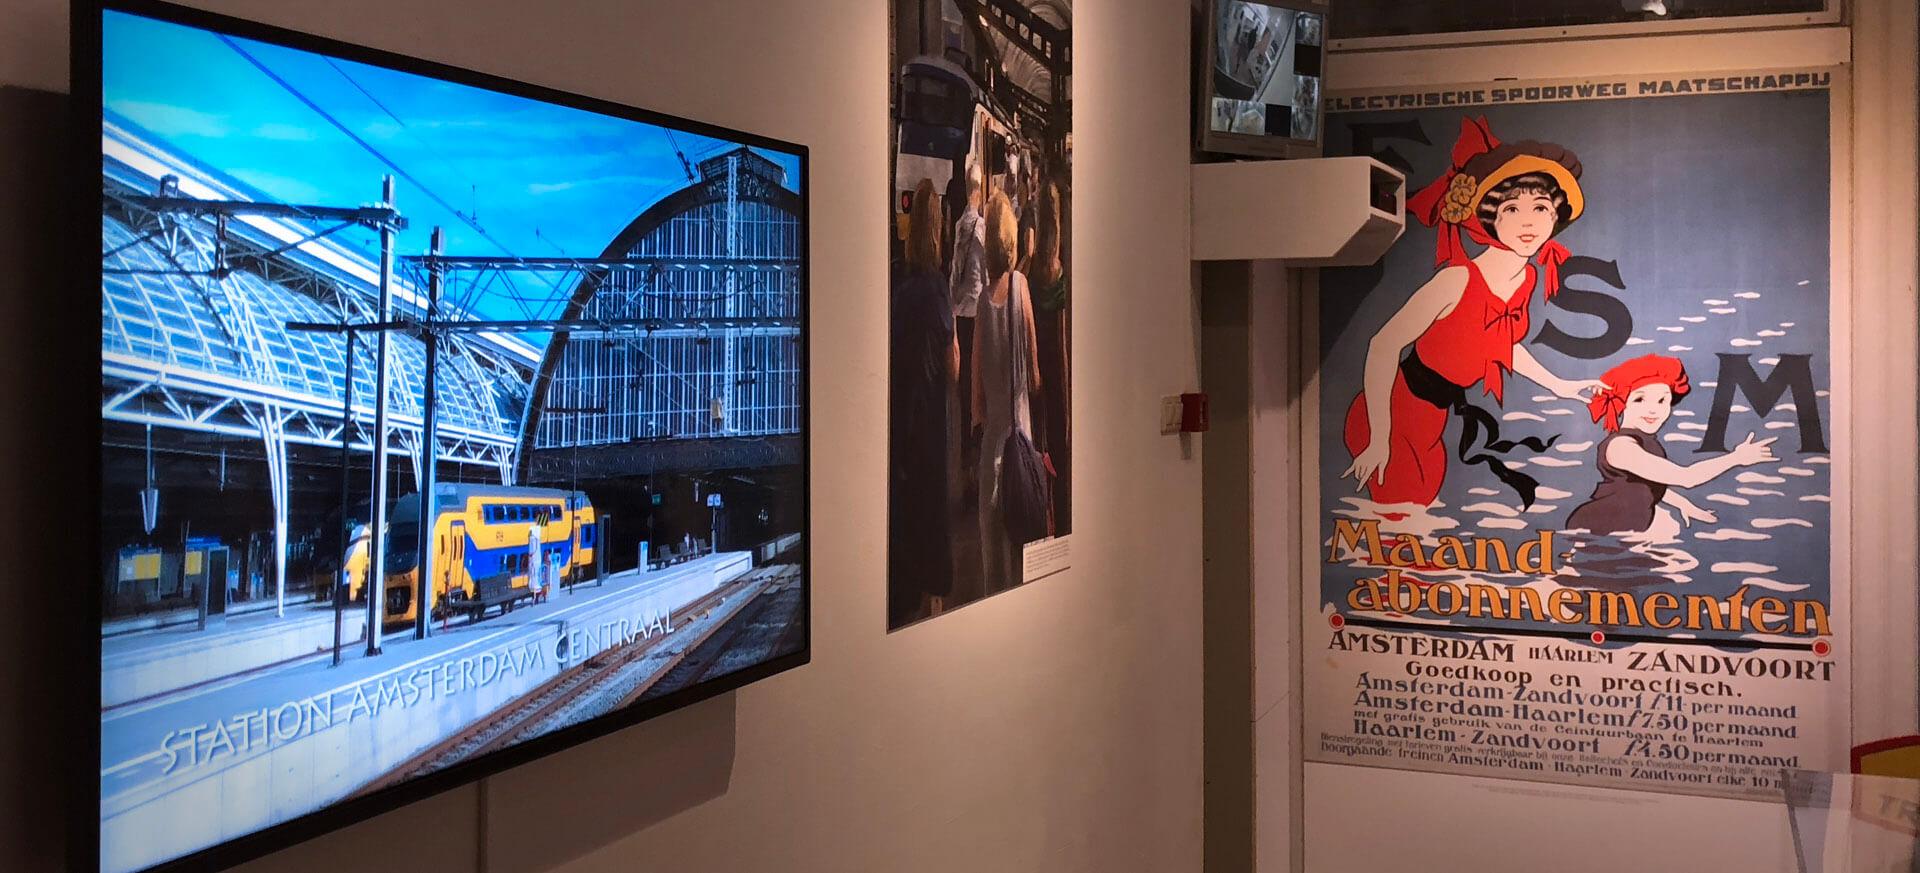 tentoonstelling documentaire